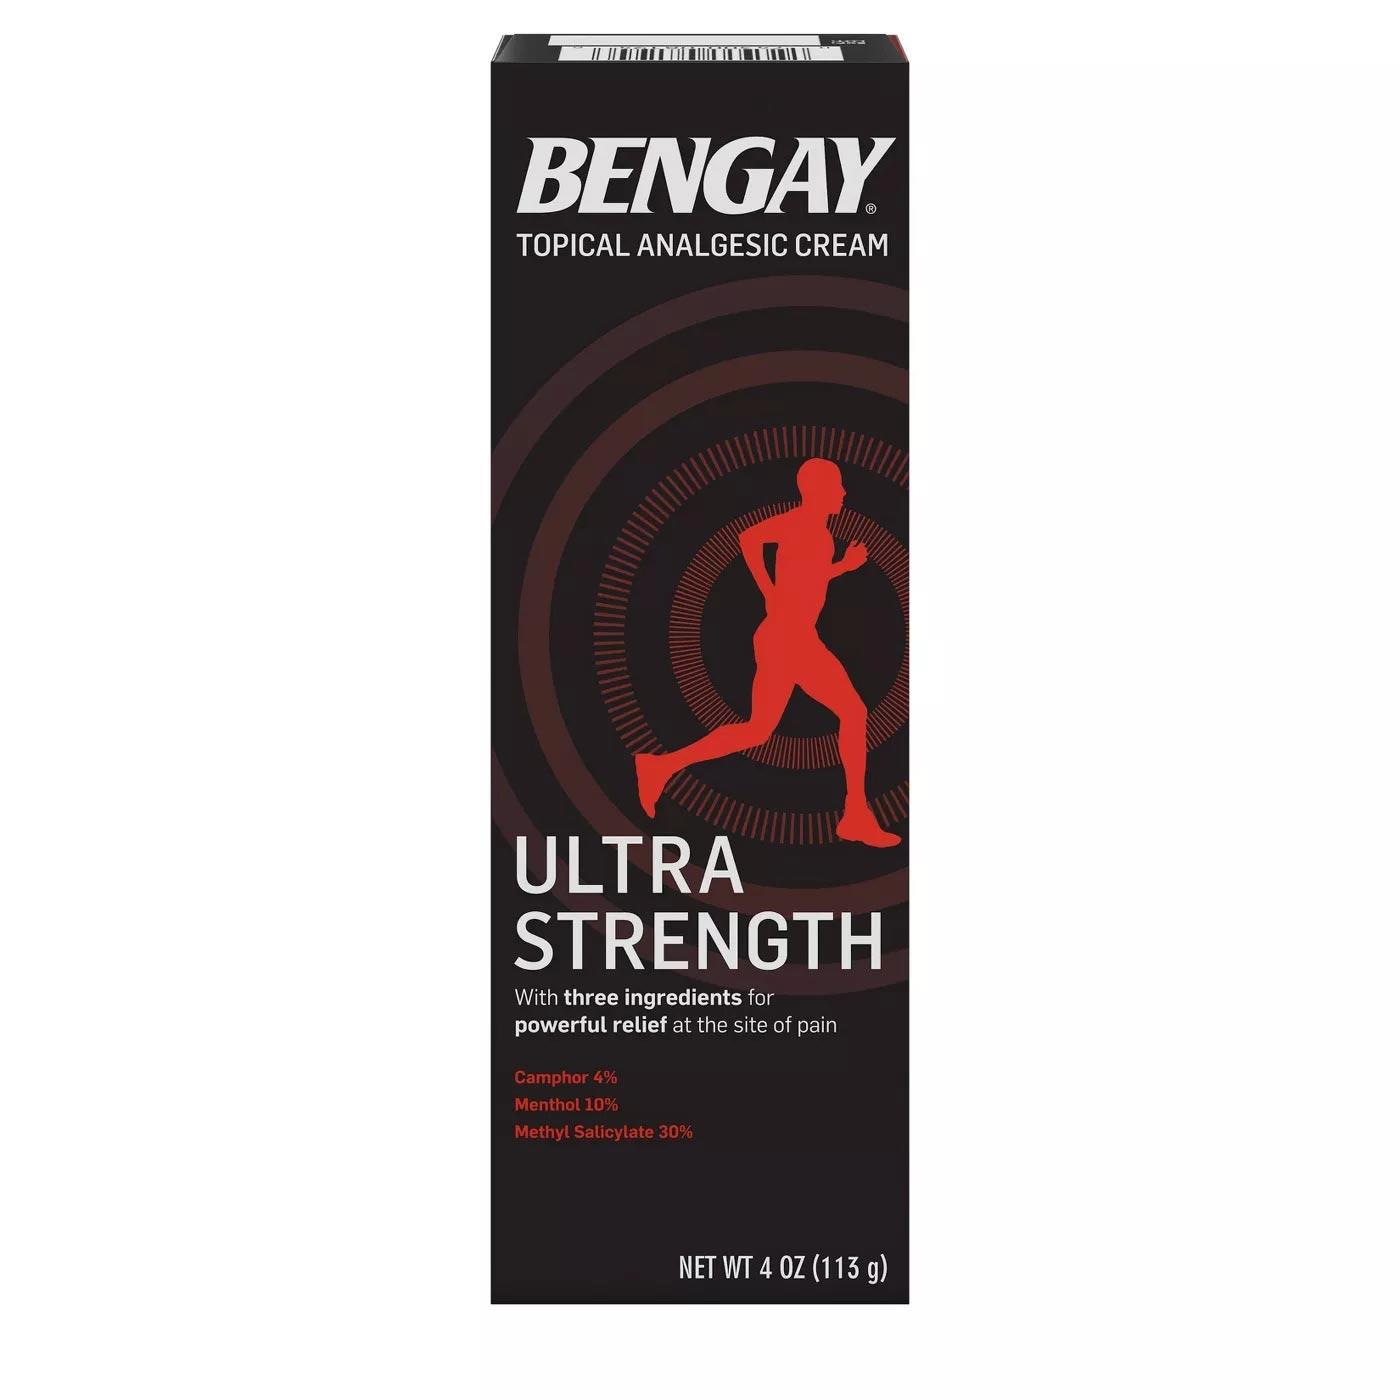 Bengay Ultra Strength Topical Analgesic Cream, 4 oz